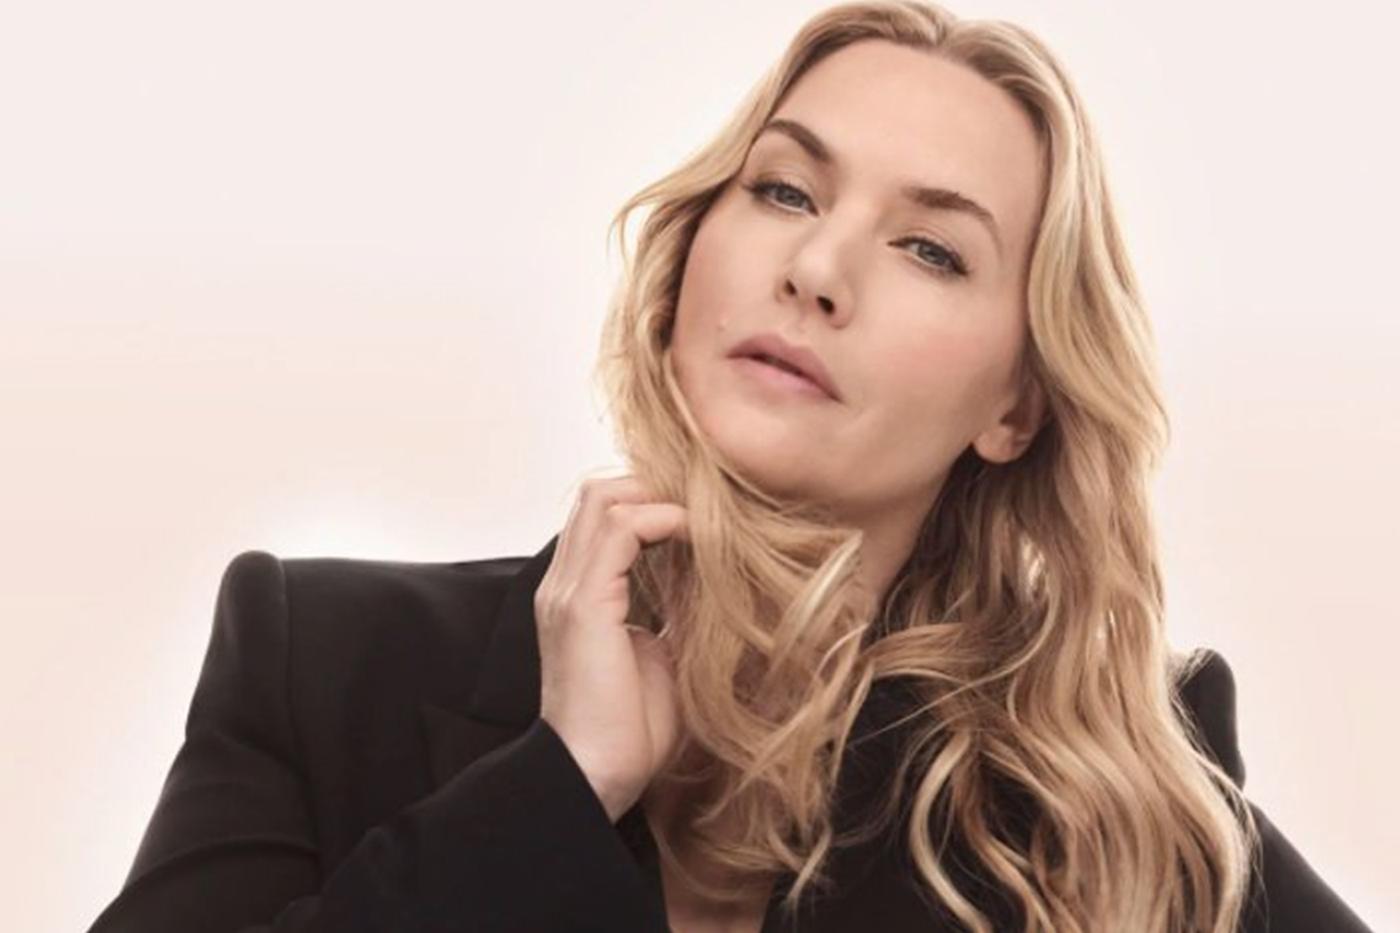 Kate Winslet announced global ambassador of L'Oréal Paris